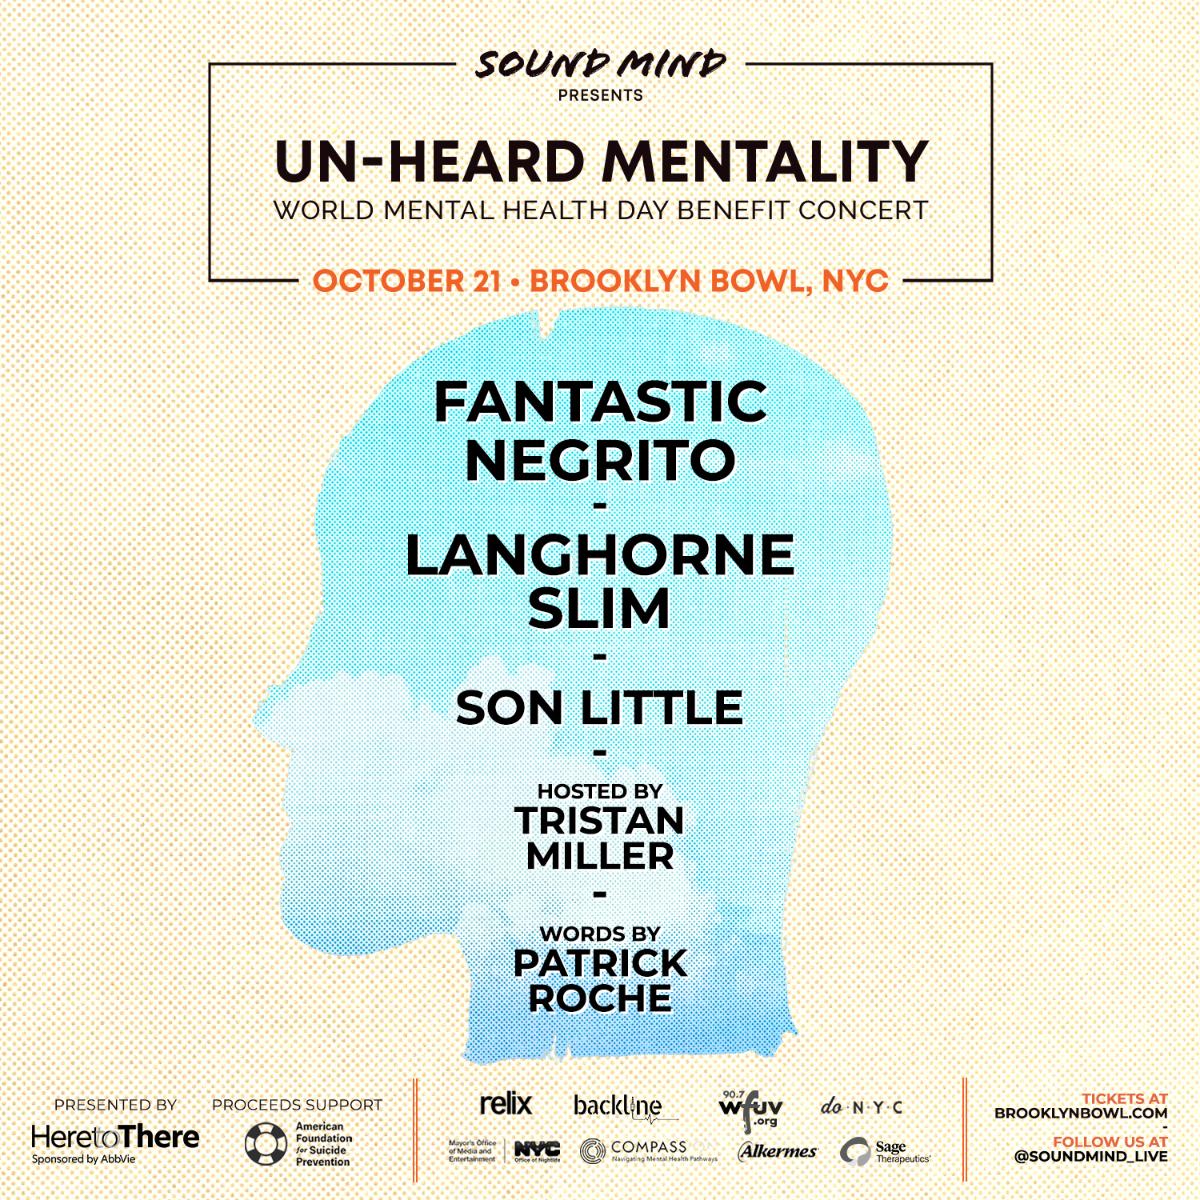 """Un-Heard Mentality"" w/ Fantastic Negrito & Langhorne Slim: World Mental Health Day Benefit Concert"